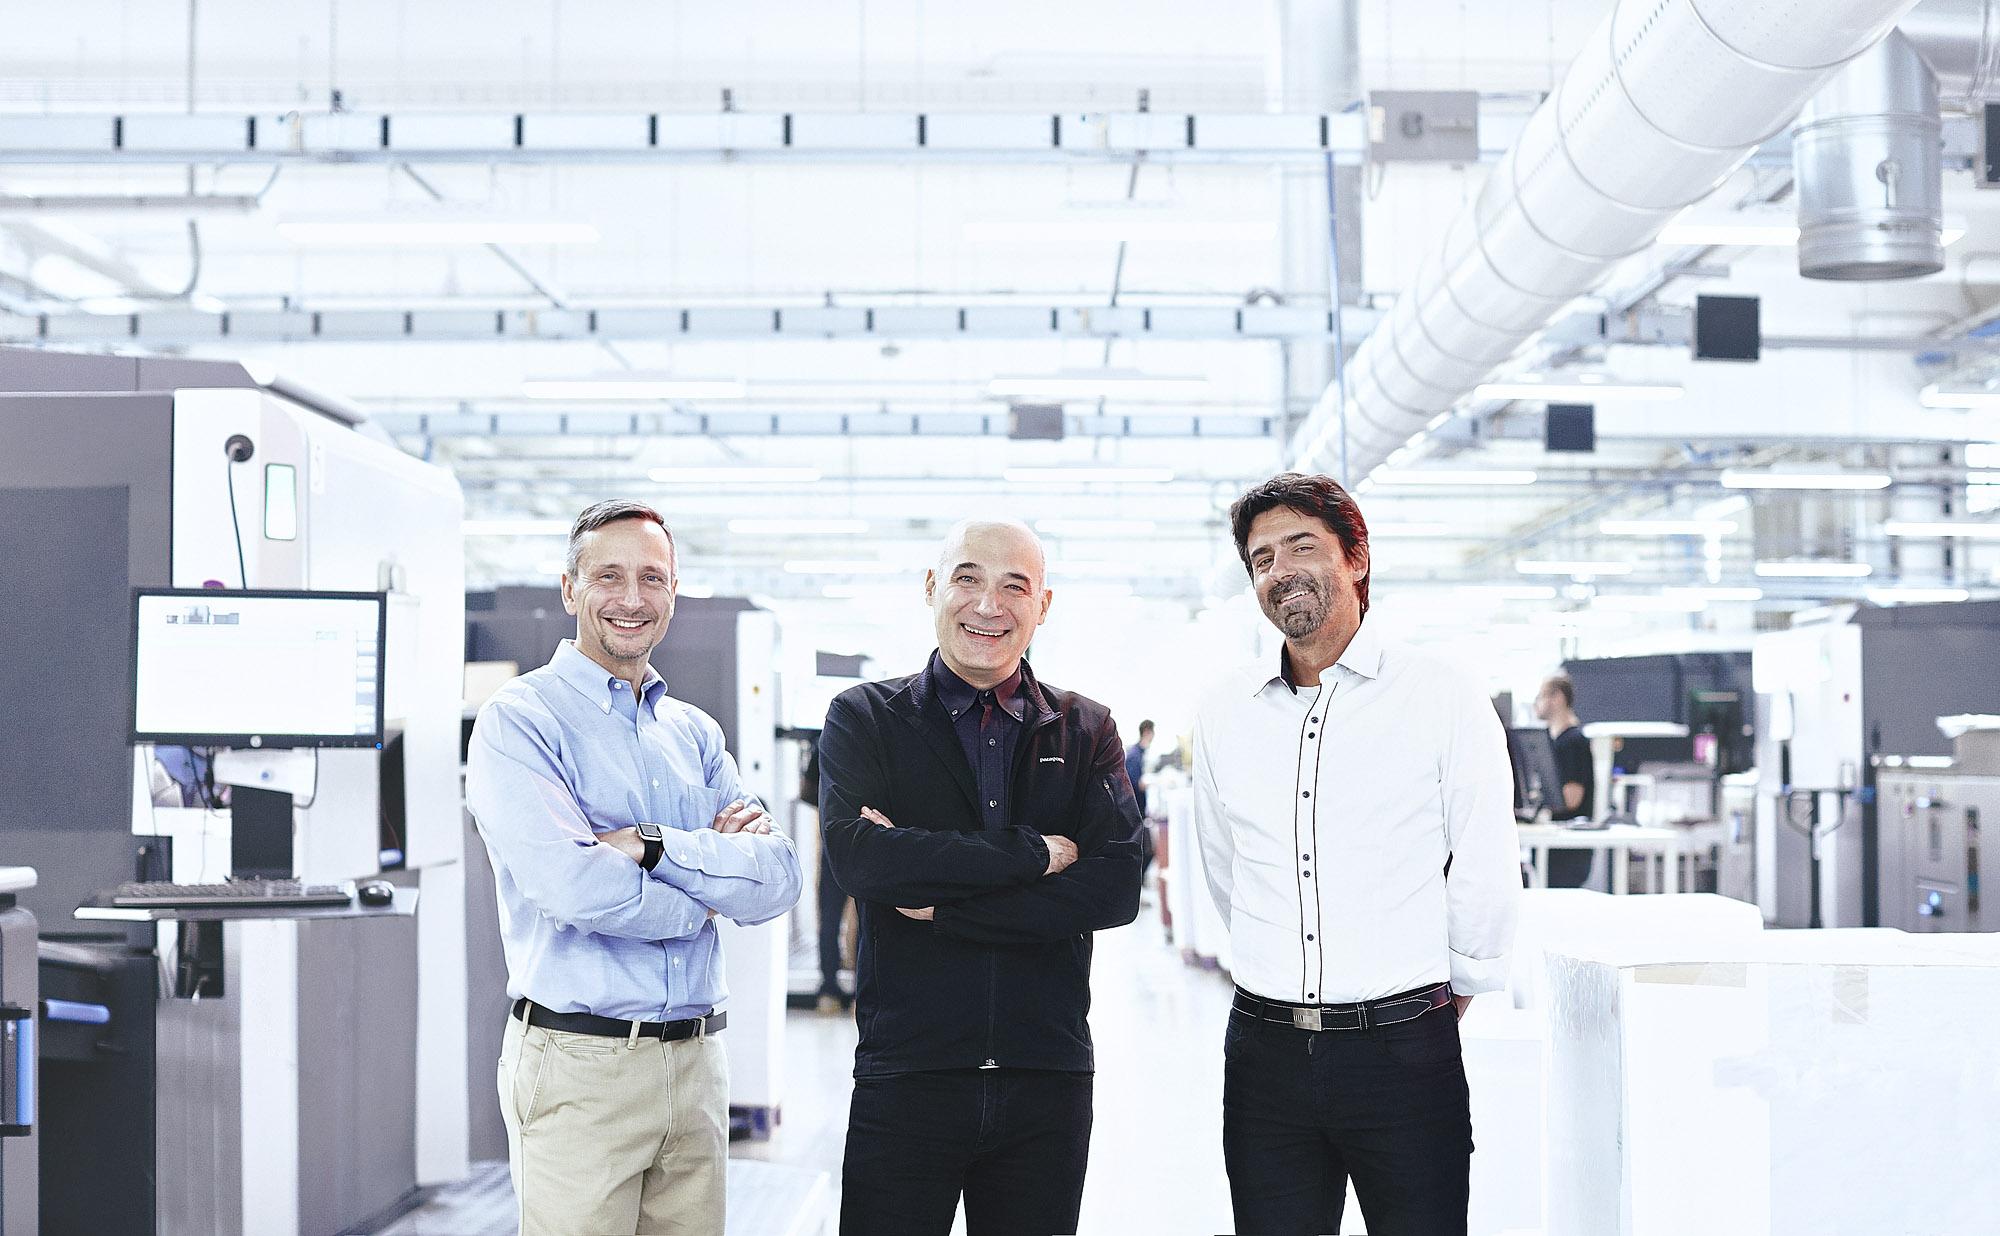 Il nuovo CdA di Pixartprinting: da sinistra P.Roatta, A.Tenderini, A.Piazzetta